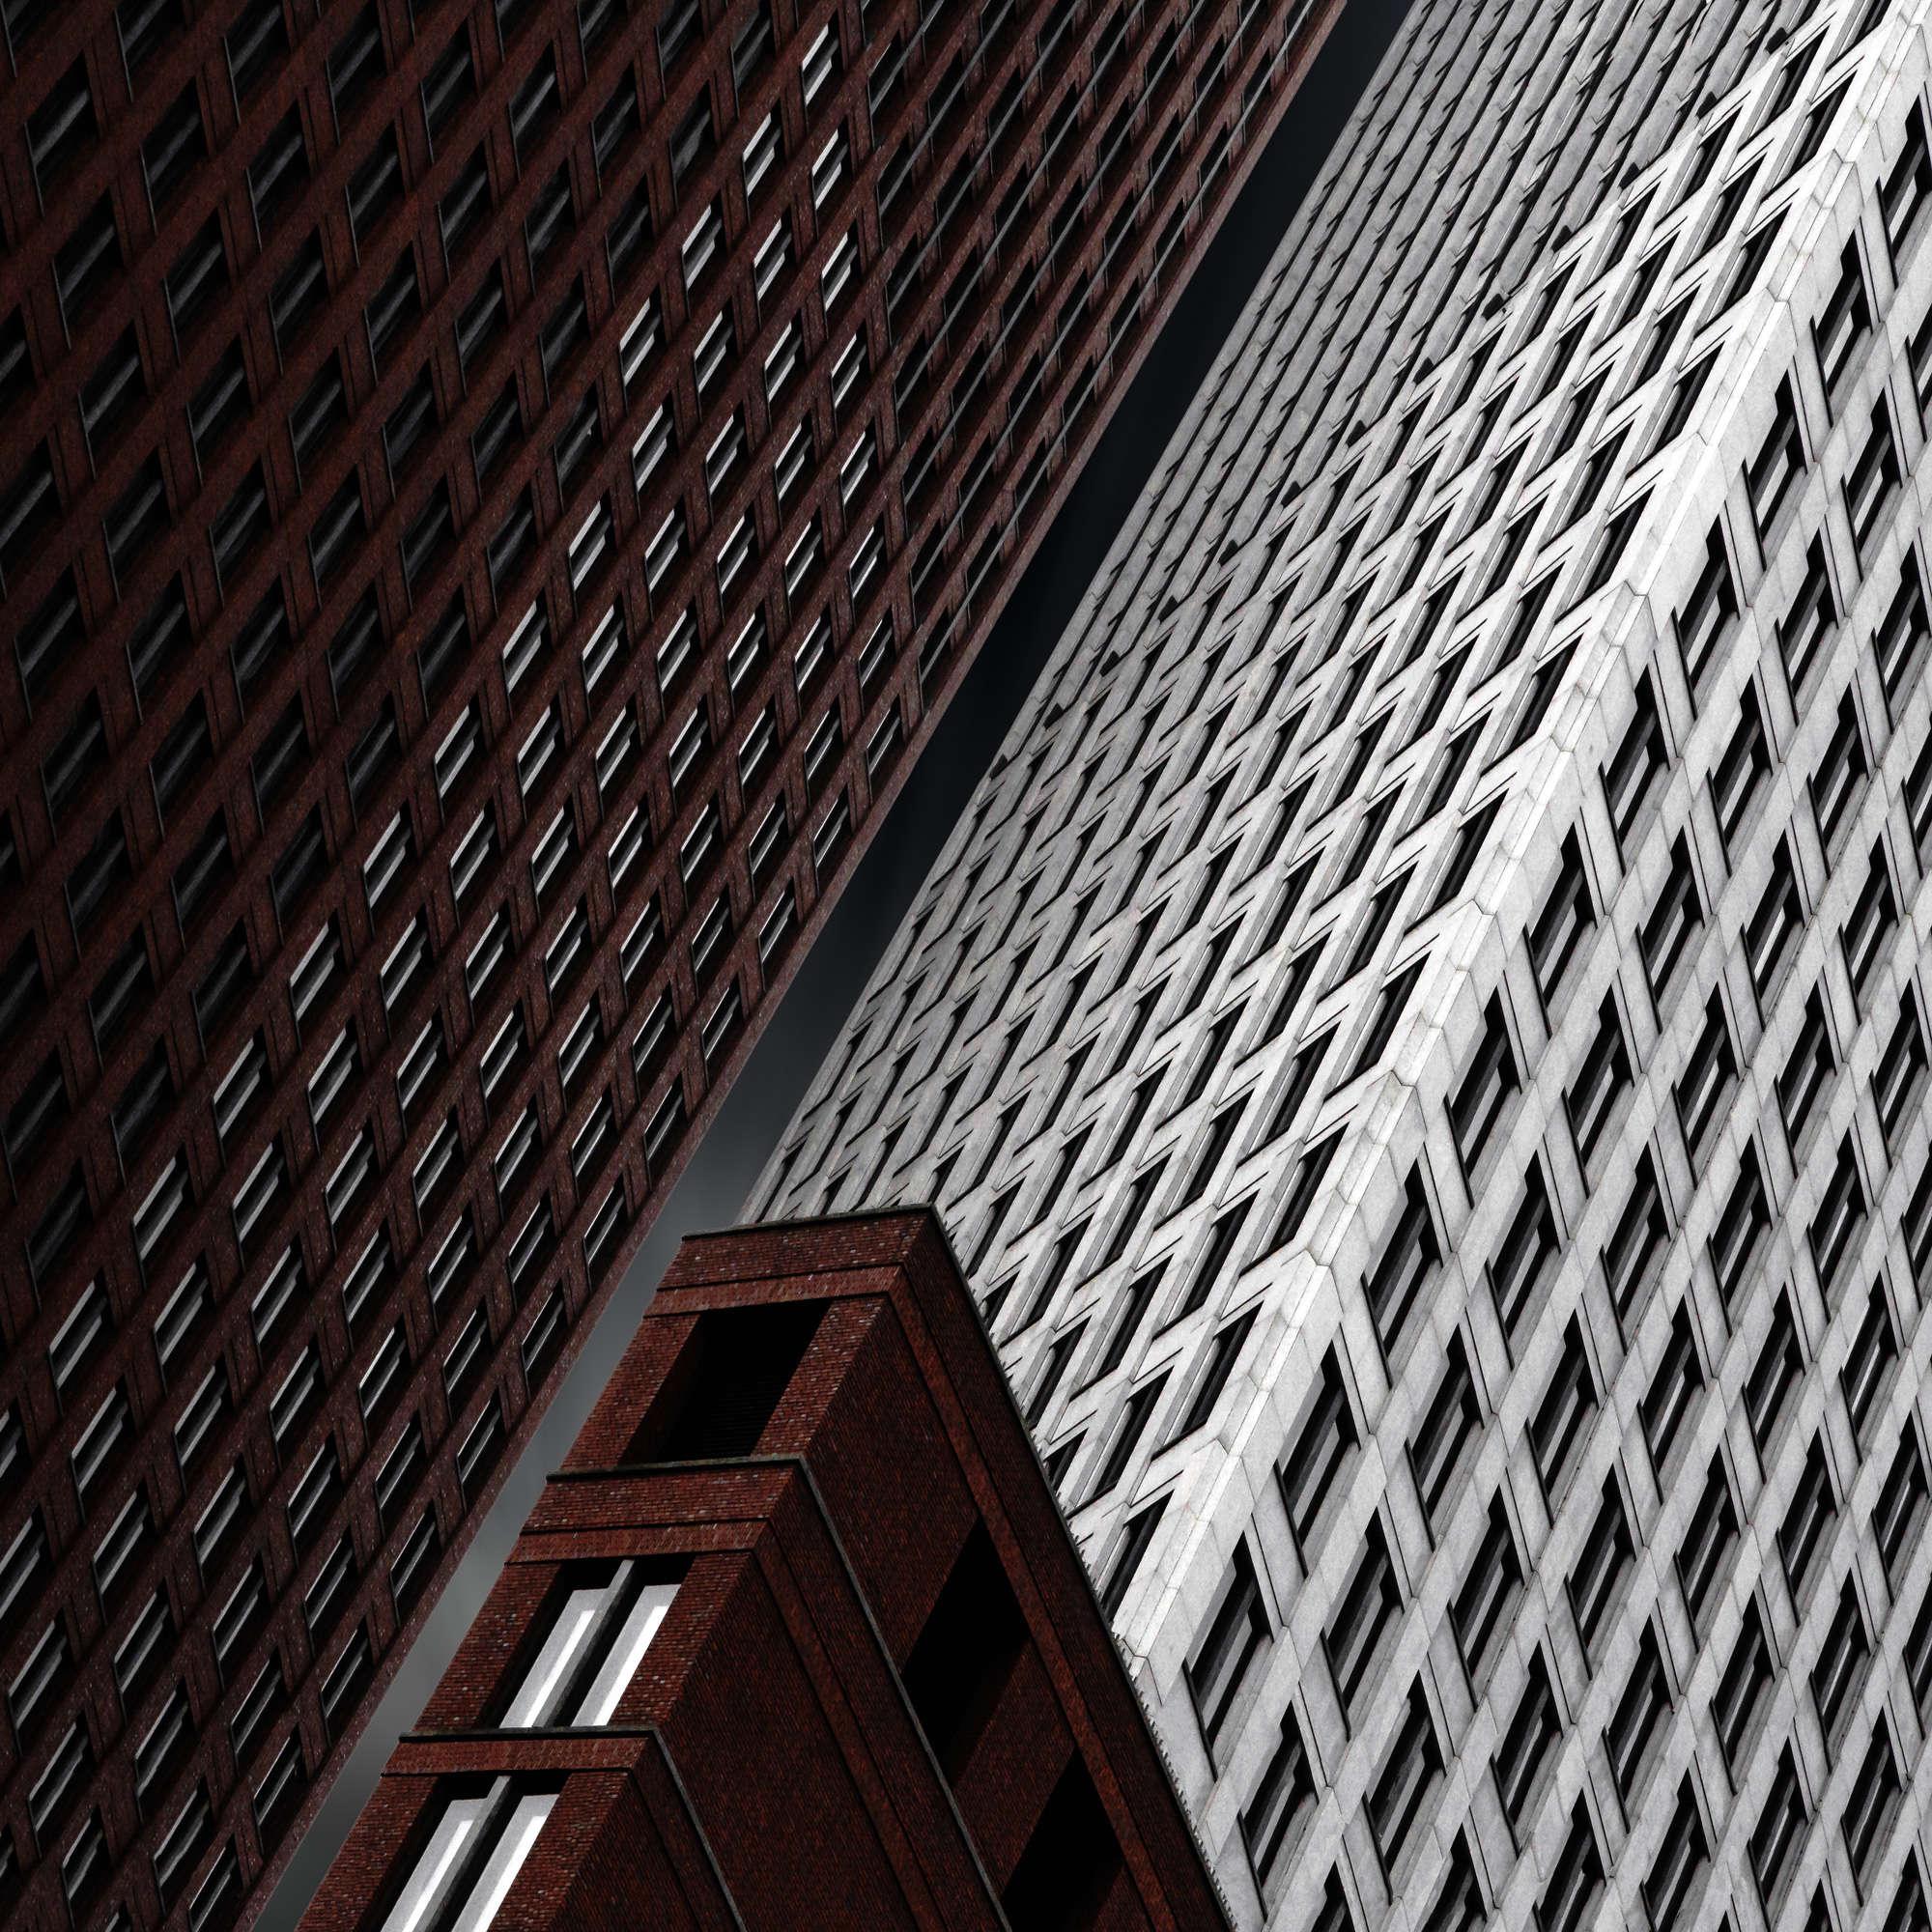 Gilbert Claes - Upwards and Upwards